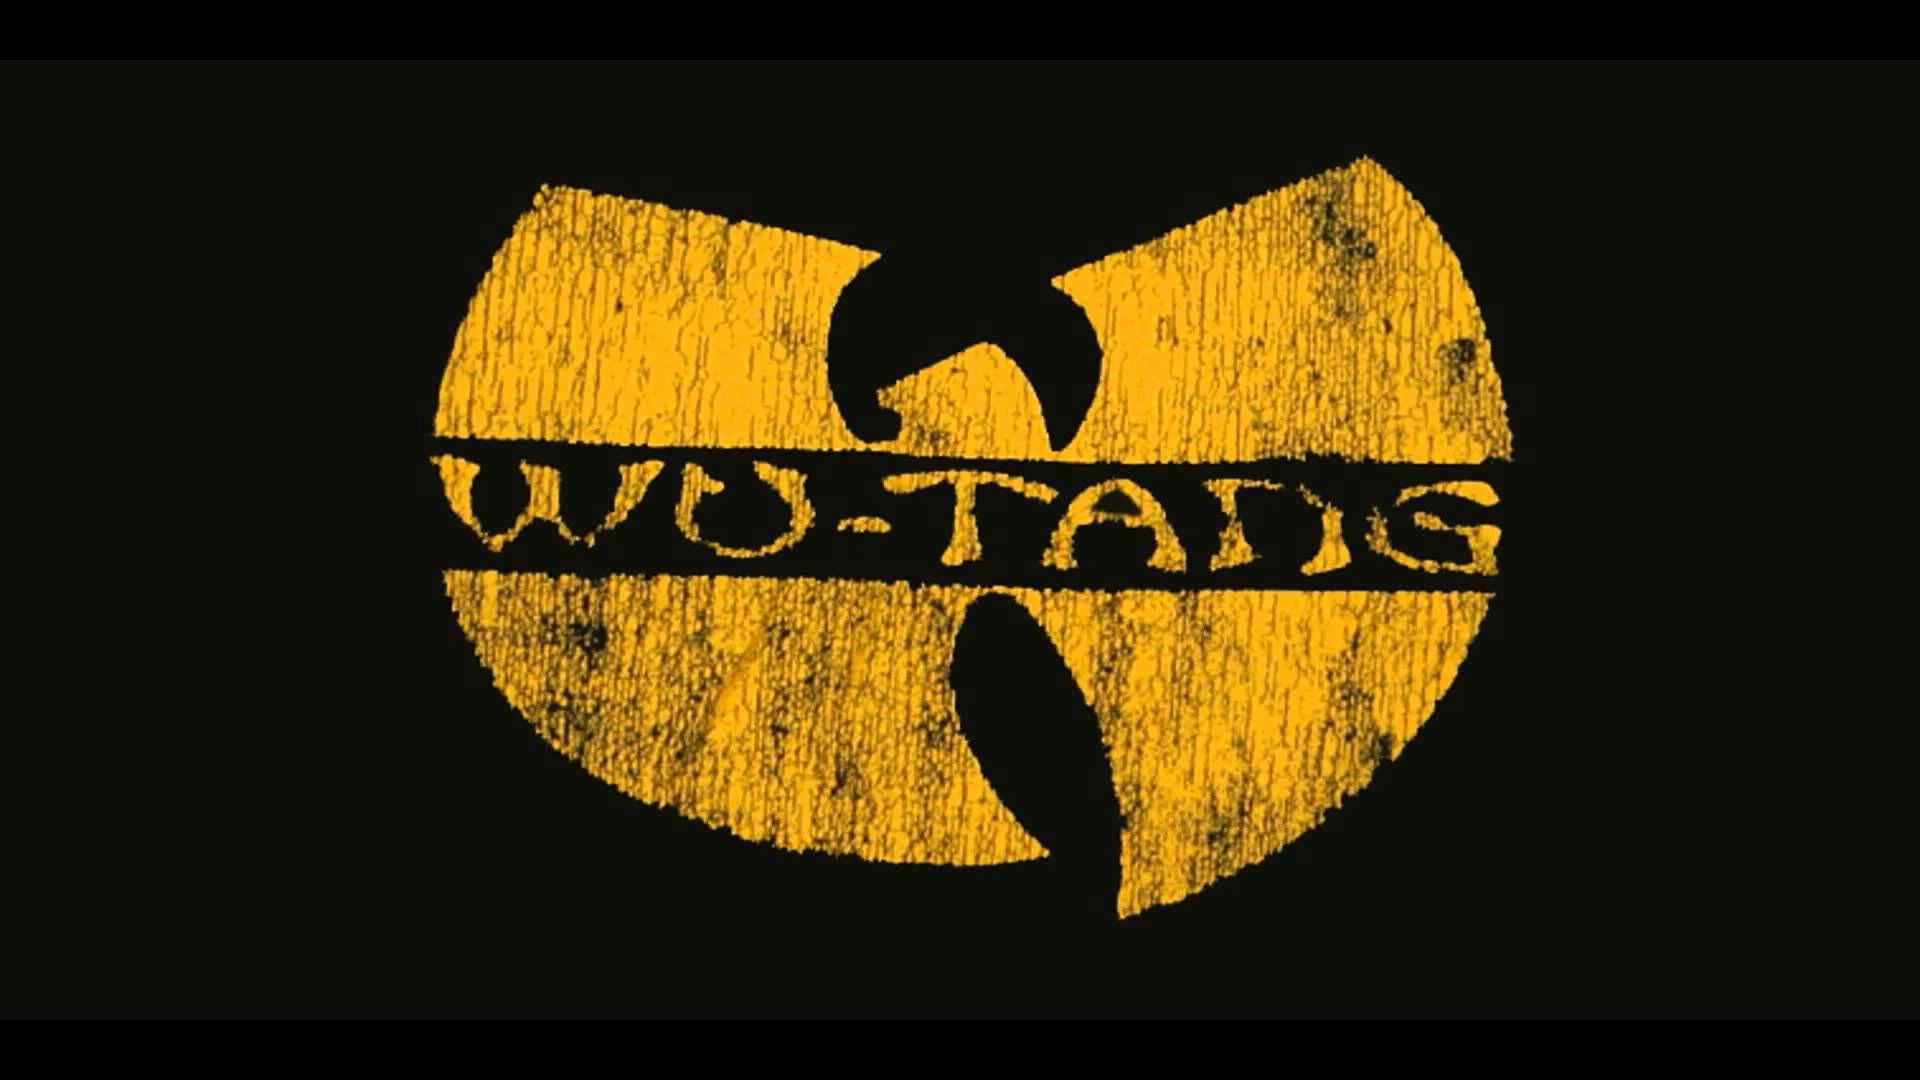 Wu Tang Clan Hd Wallpapers And Backgrounds 630 487 Wu Tang B